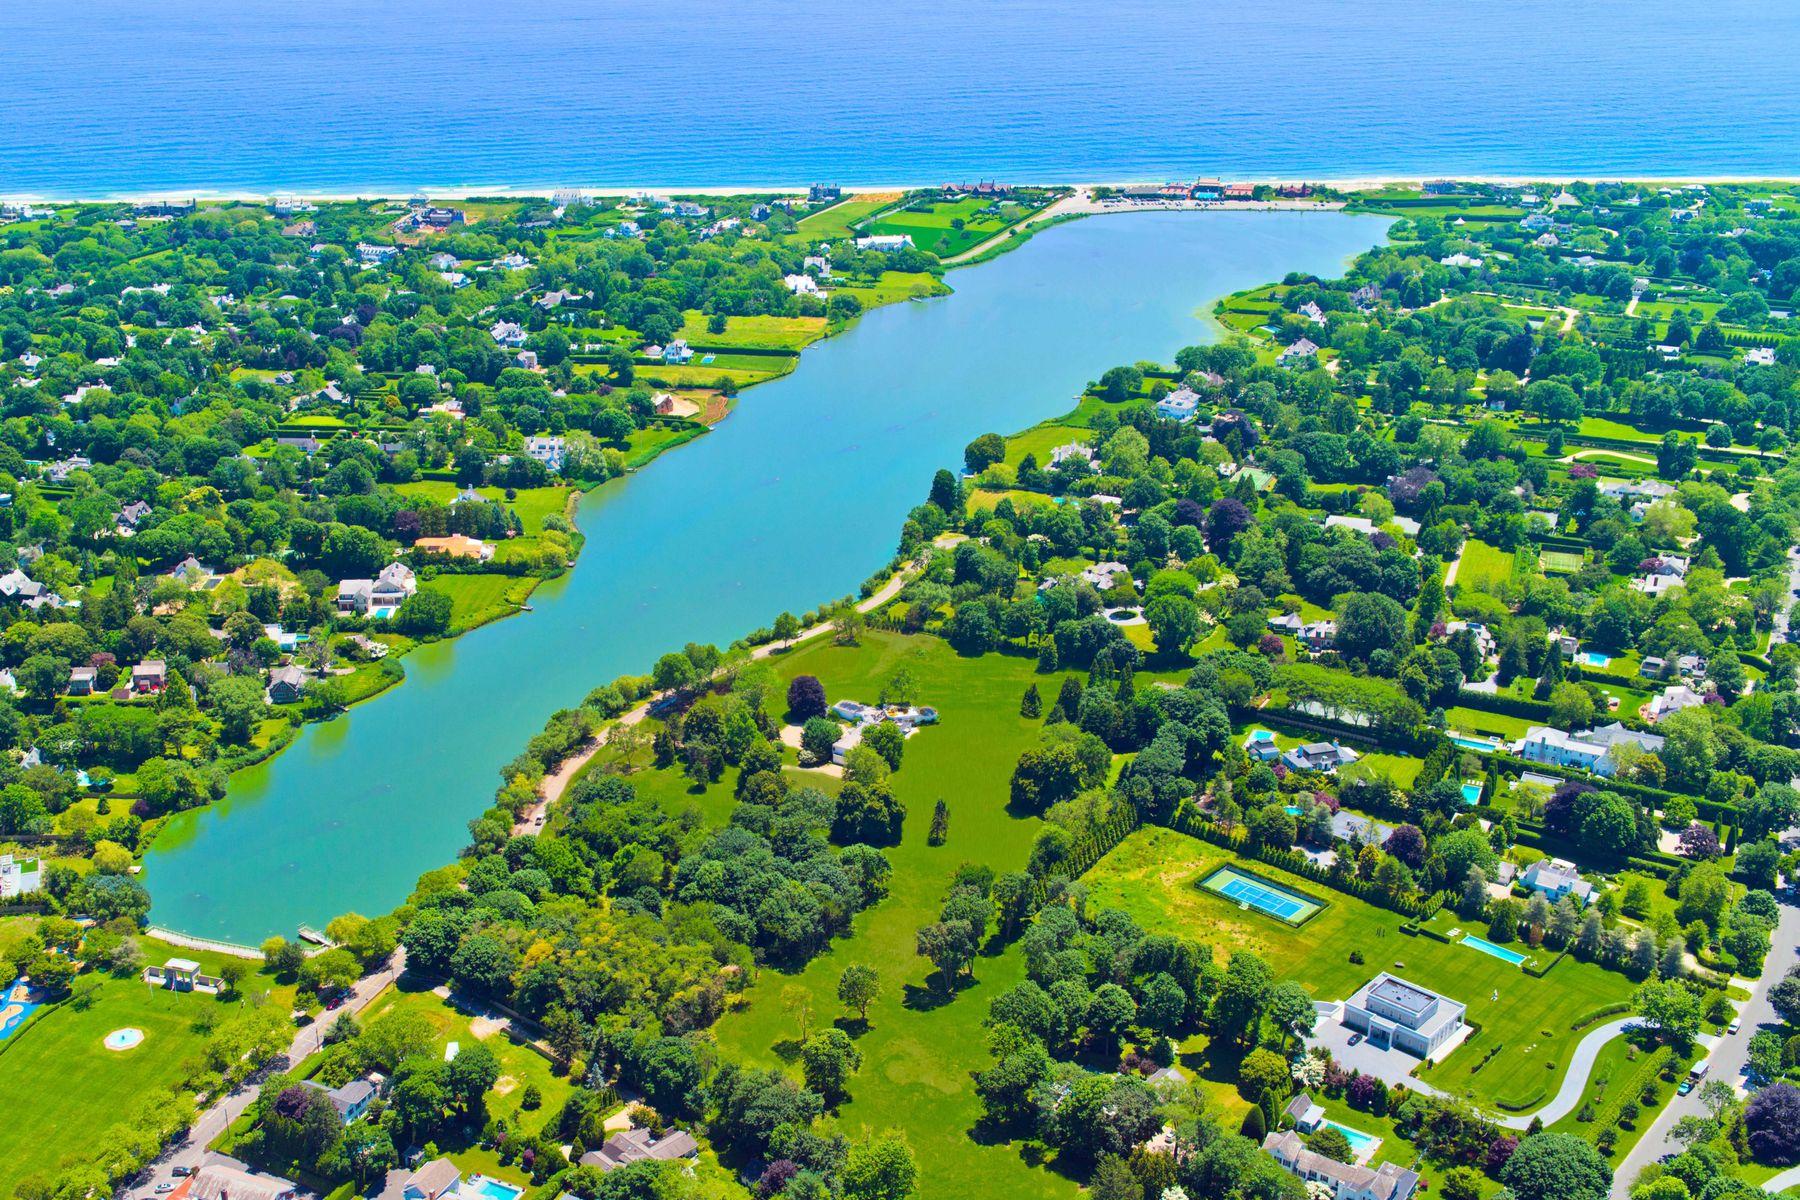 Terreno por un Venta en Spectacular Waterviews Over Lake Agawam 153 Pond Lane, Lot 5 Southampton, Nueva York 11968 Estados Unidos